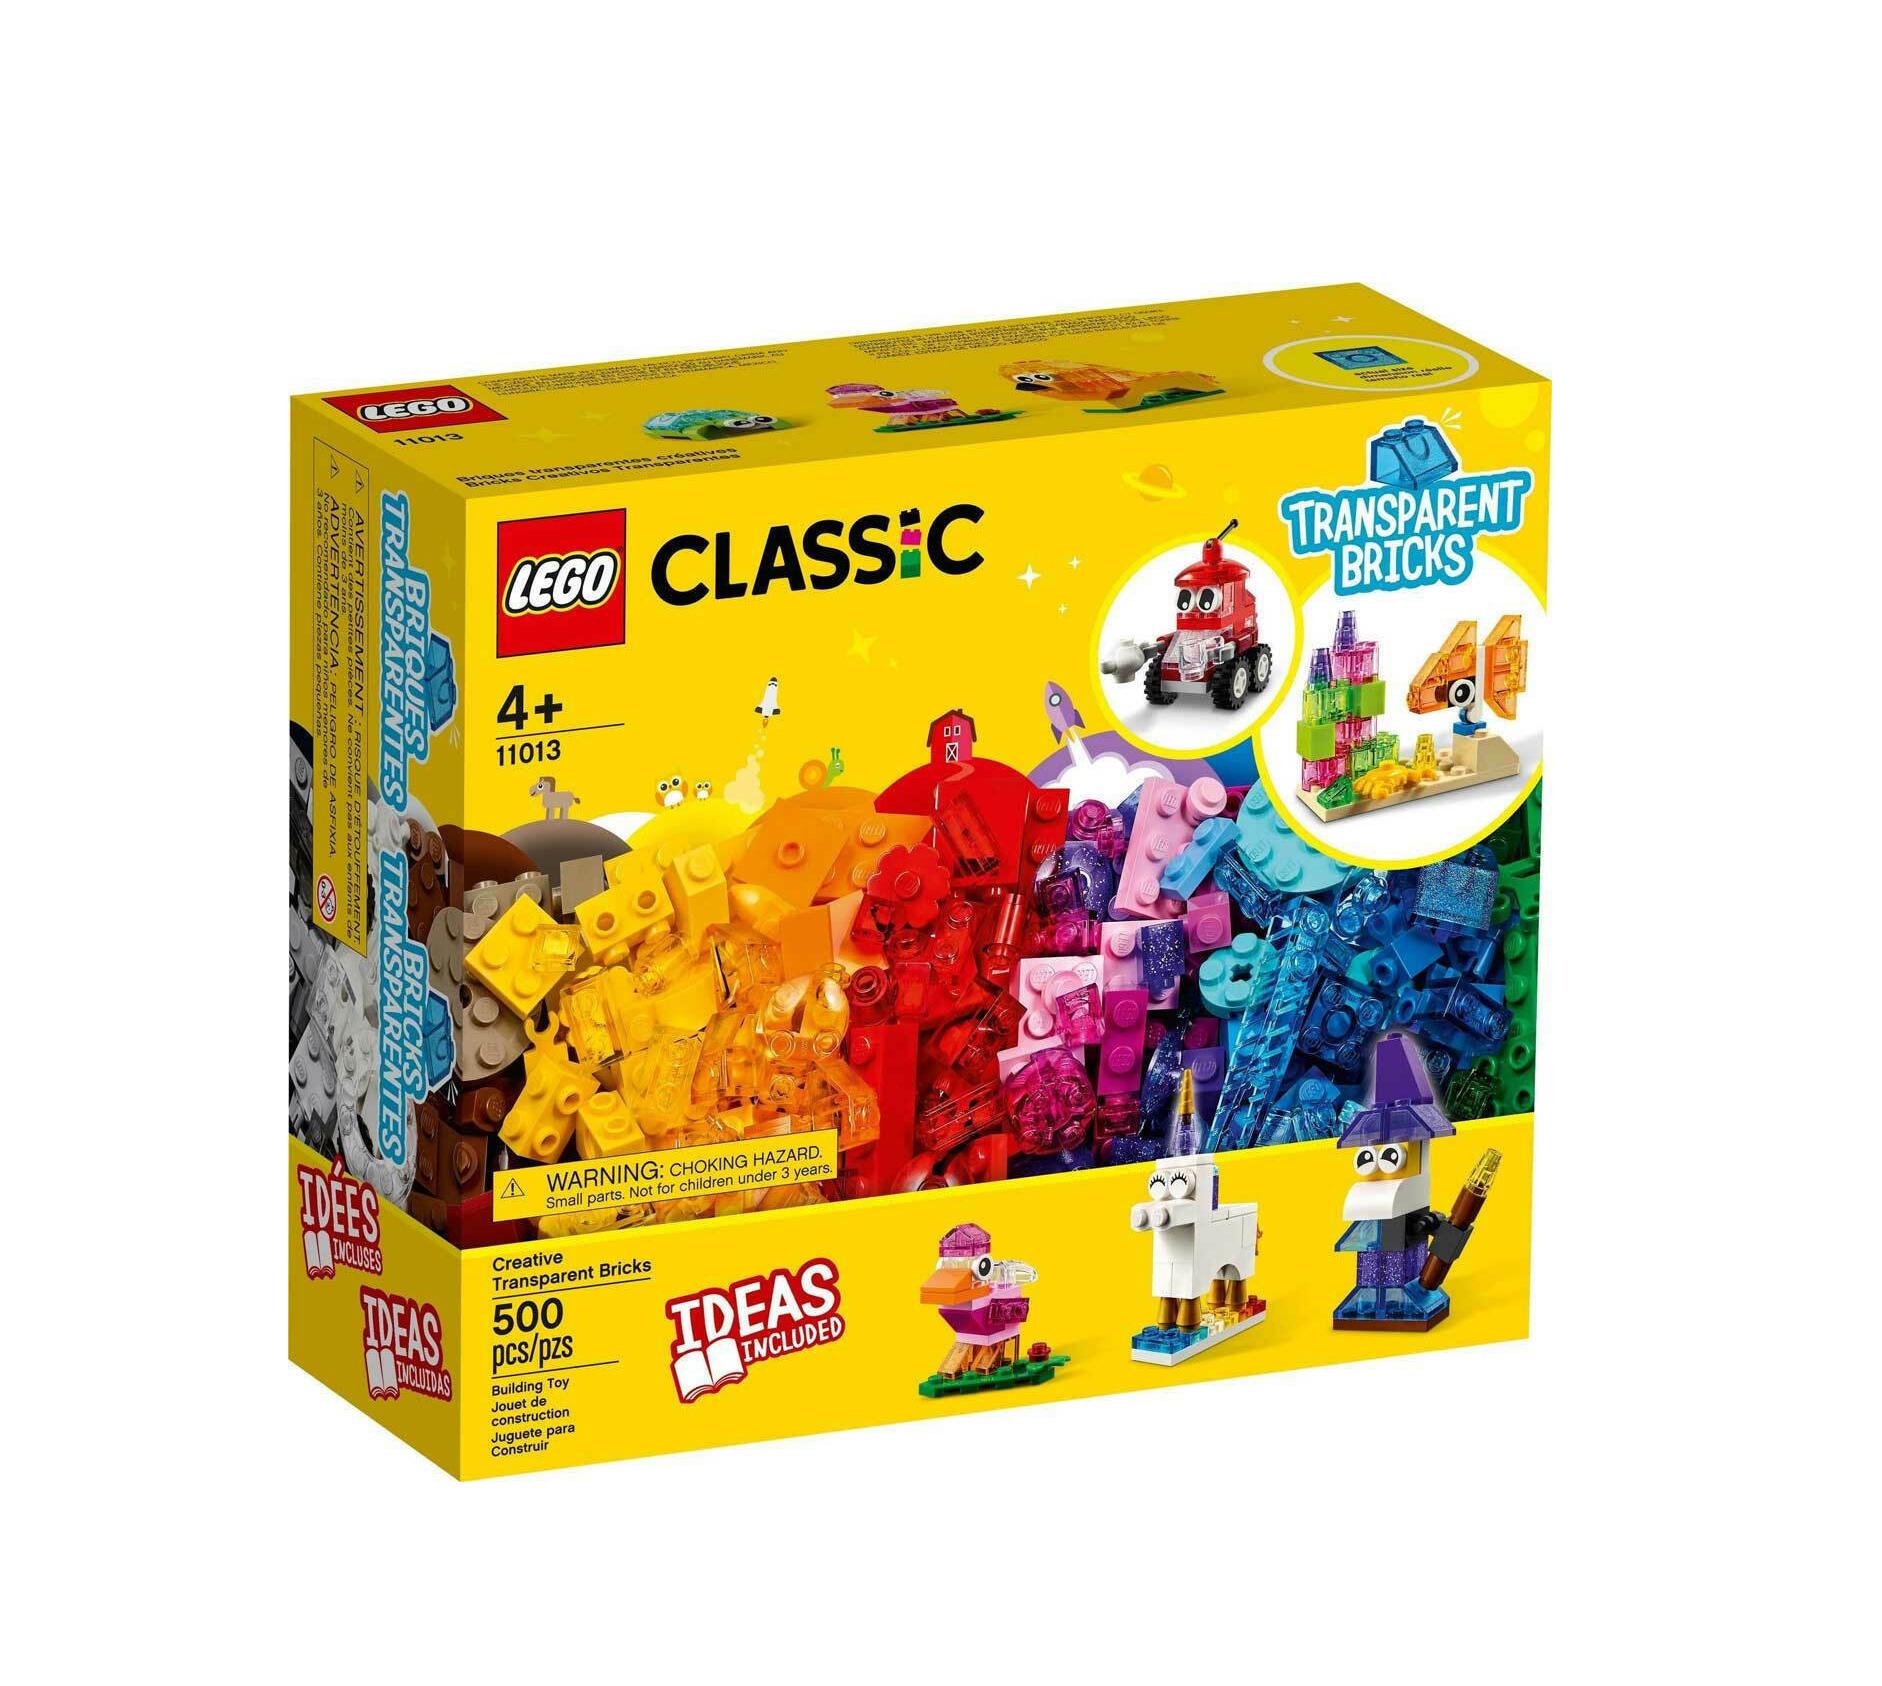 Lego Classic: Creative Transparent Bricks 11013